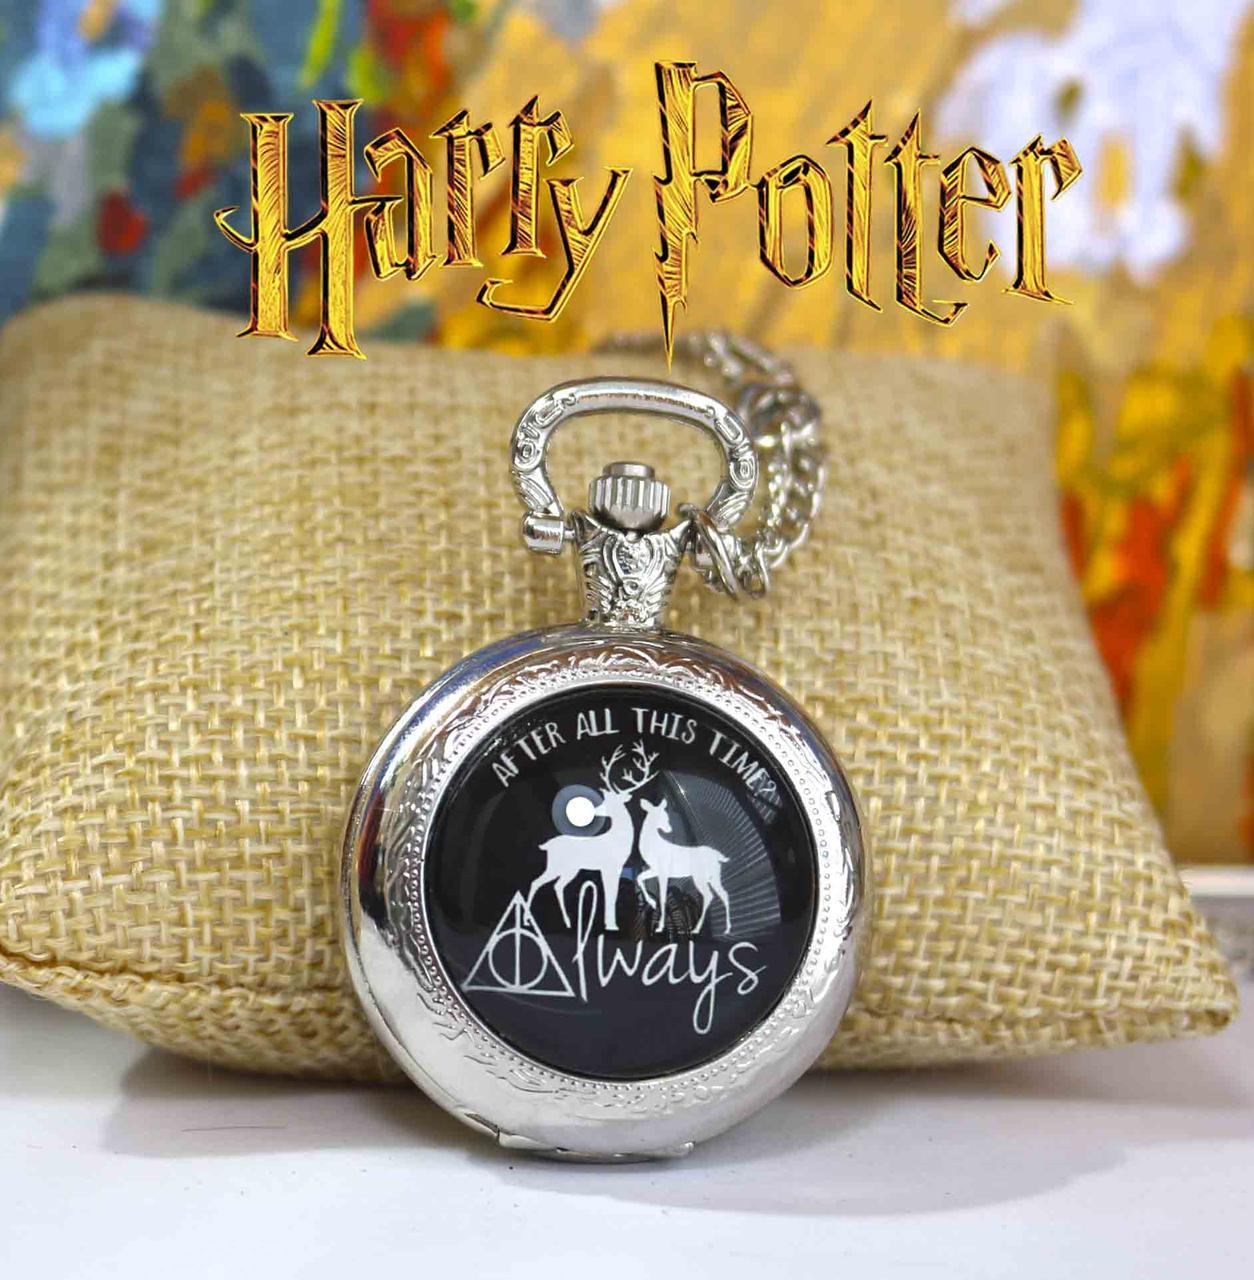 Часы карманные ★ Гарри Поттер ★ Harry Potter ★ Часы ...